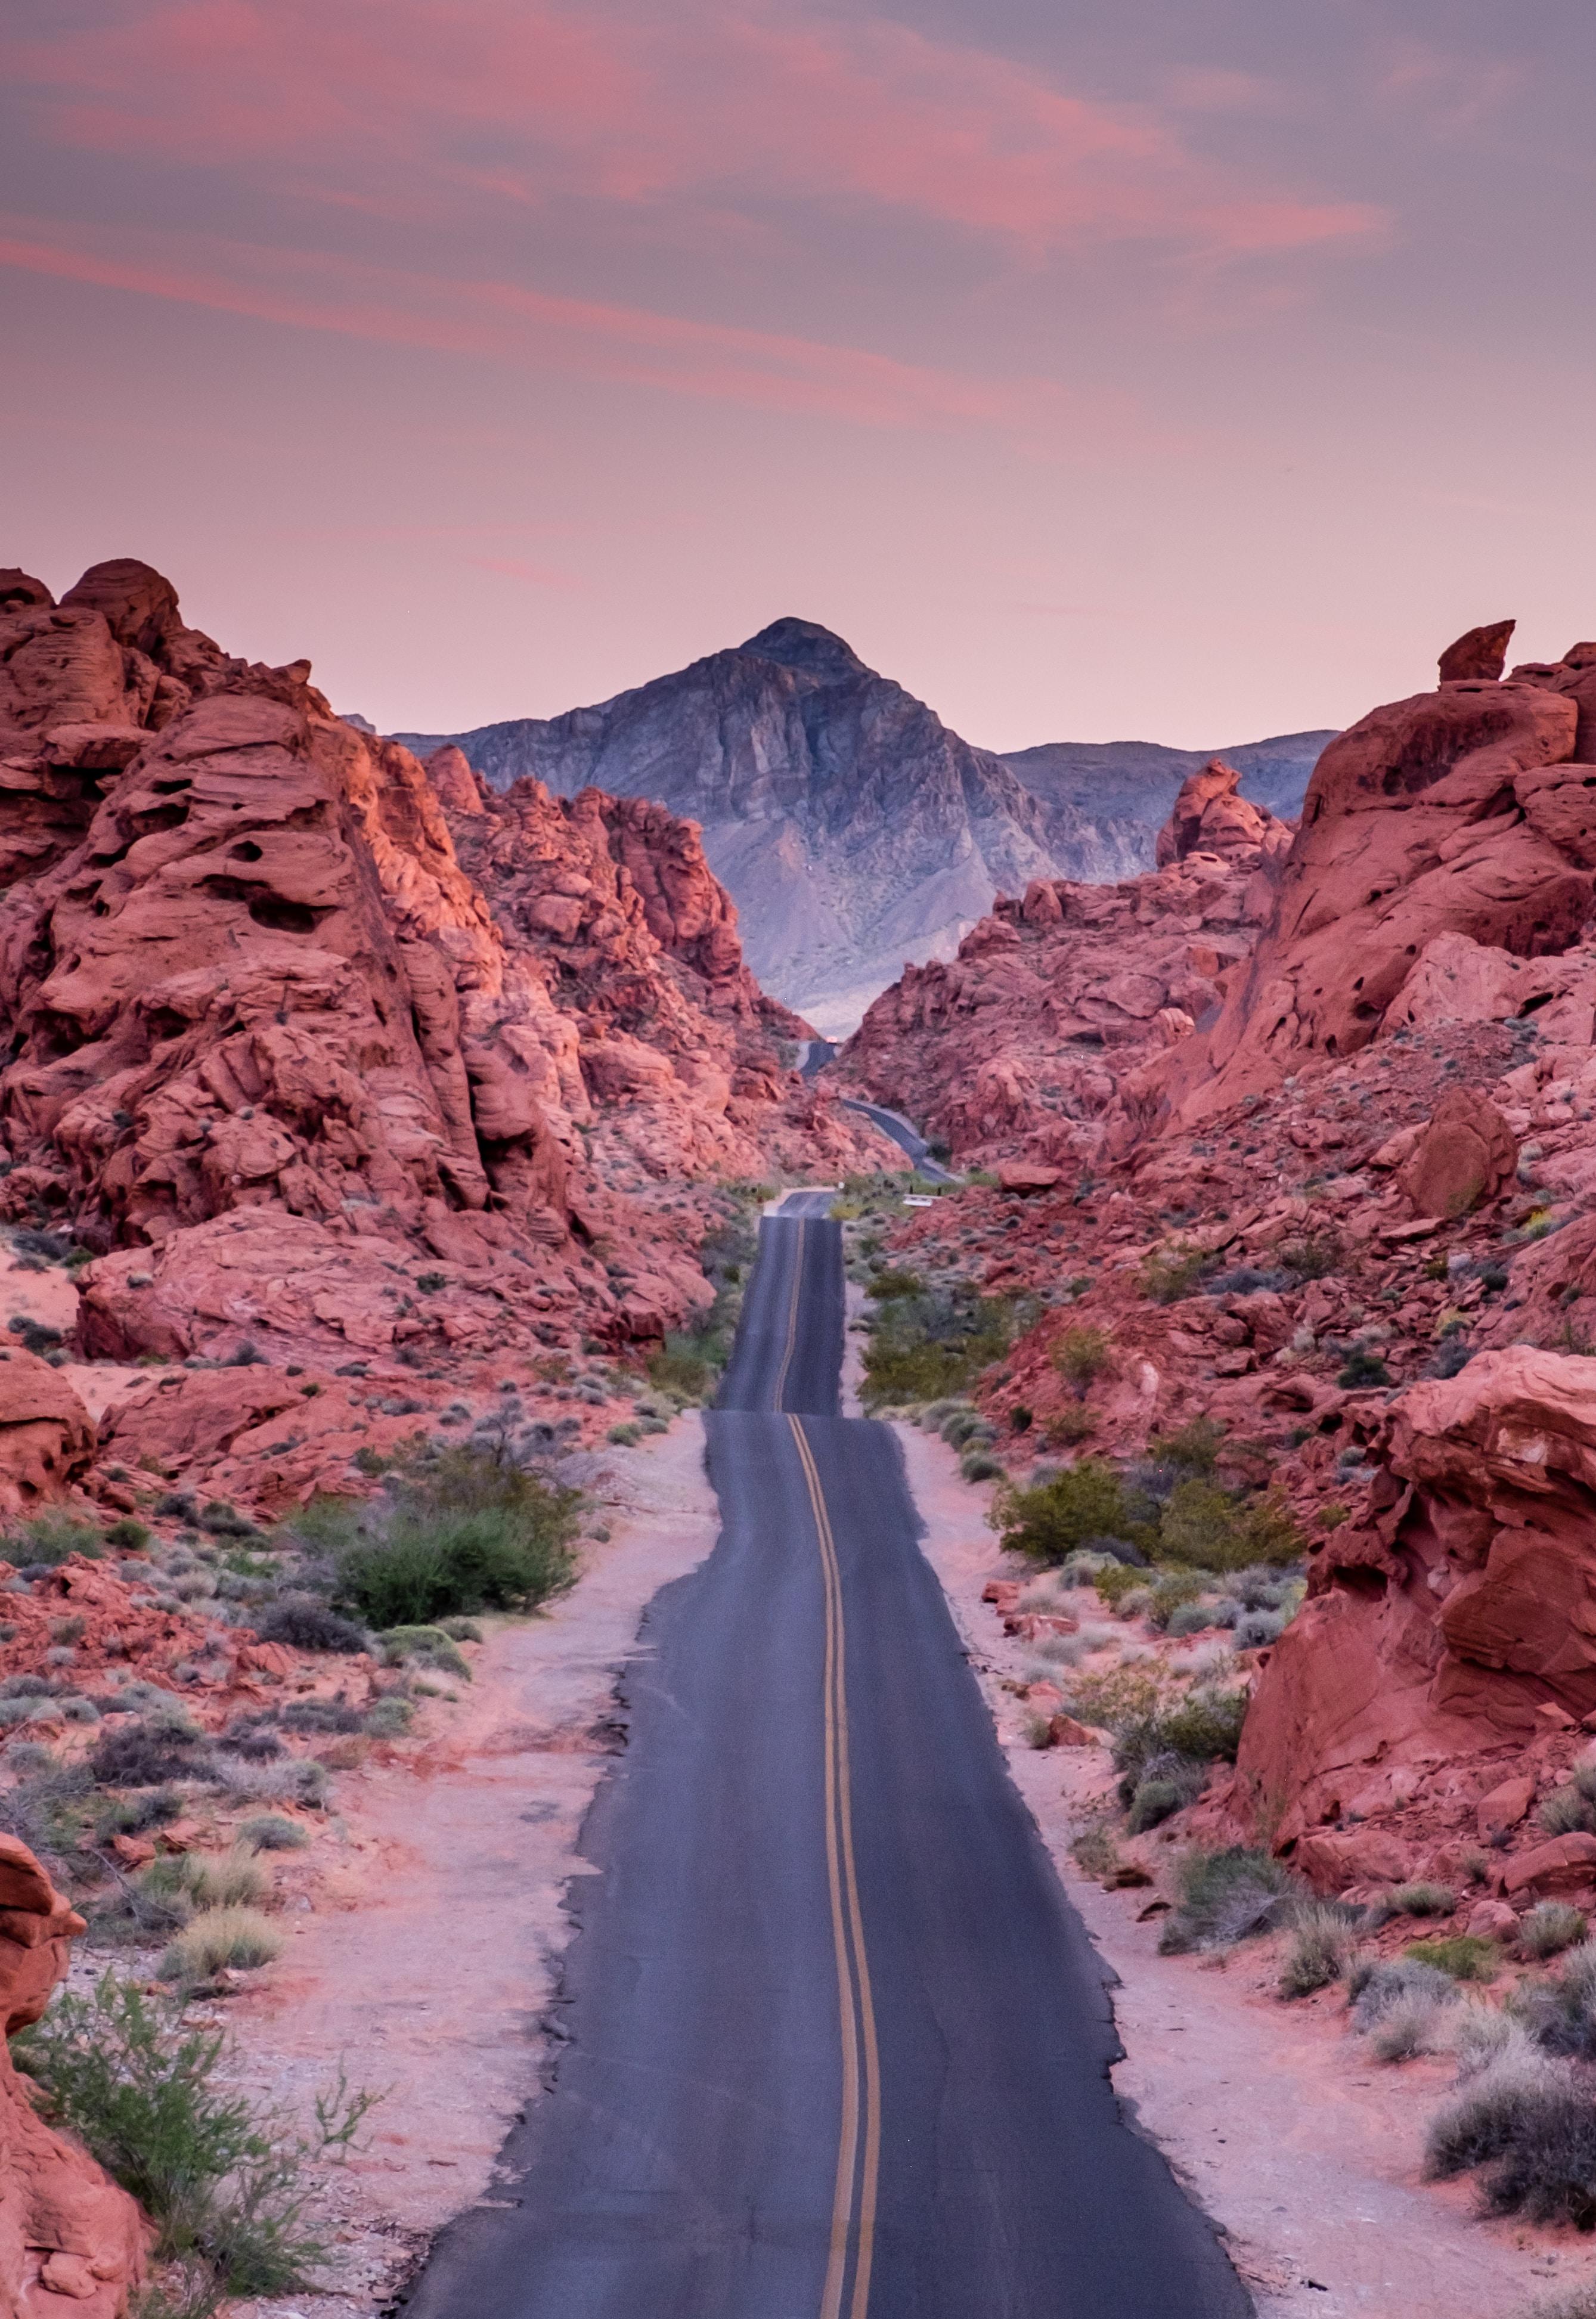 photo of empty road between rock formations